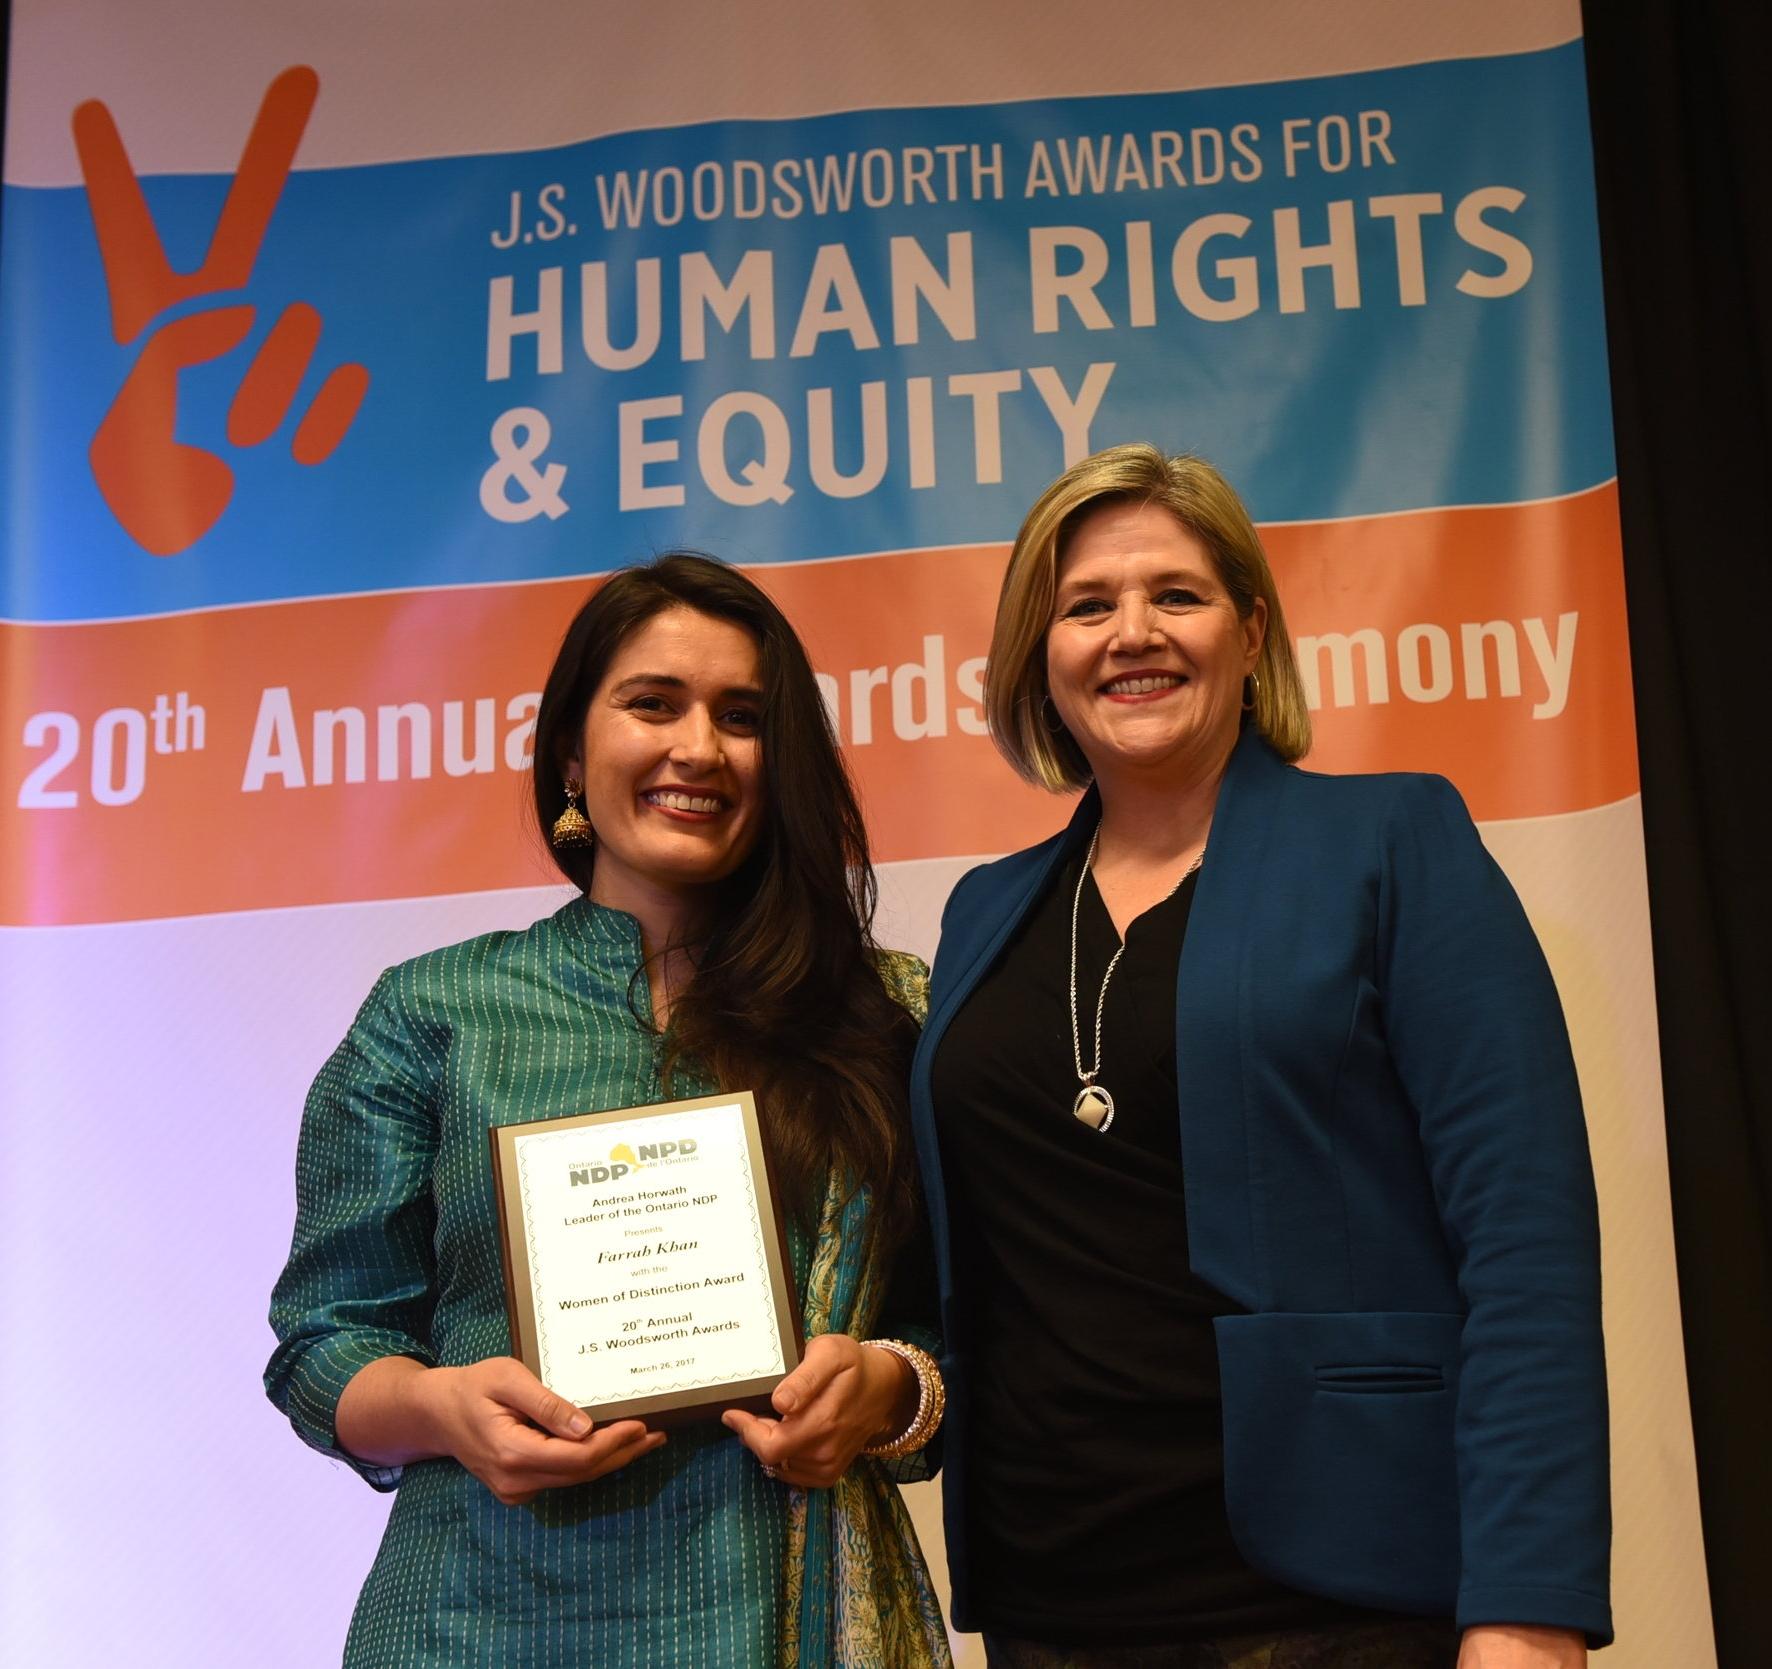 NDP leader Andrea Horwath (r) and Woman of Distinction winner Farrah Khan